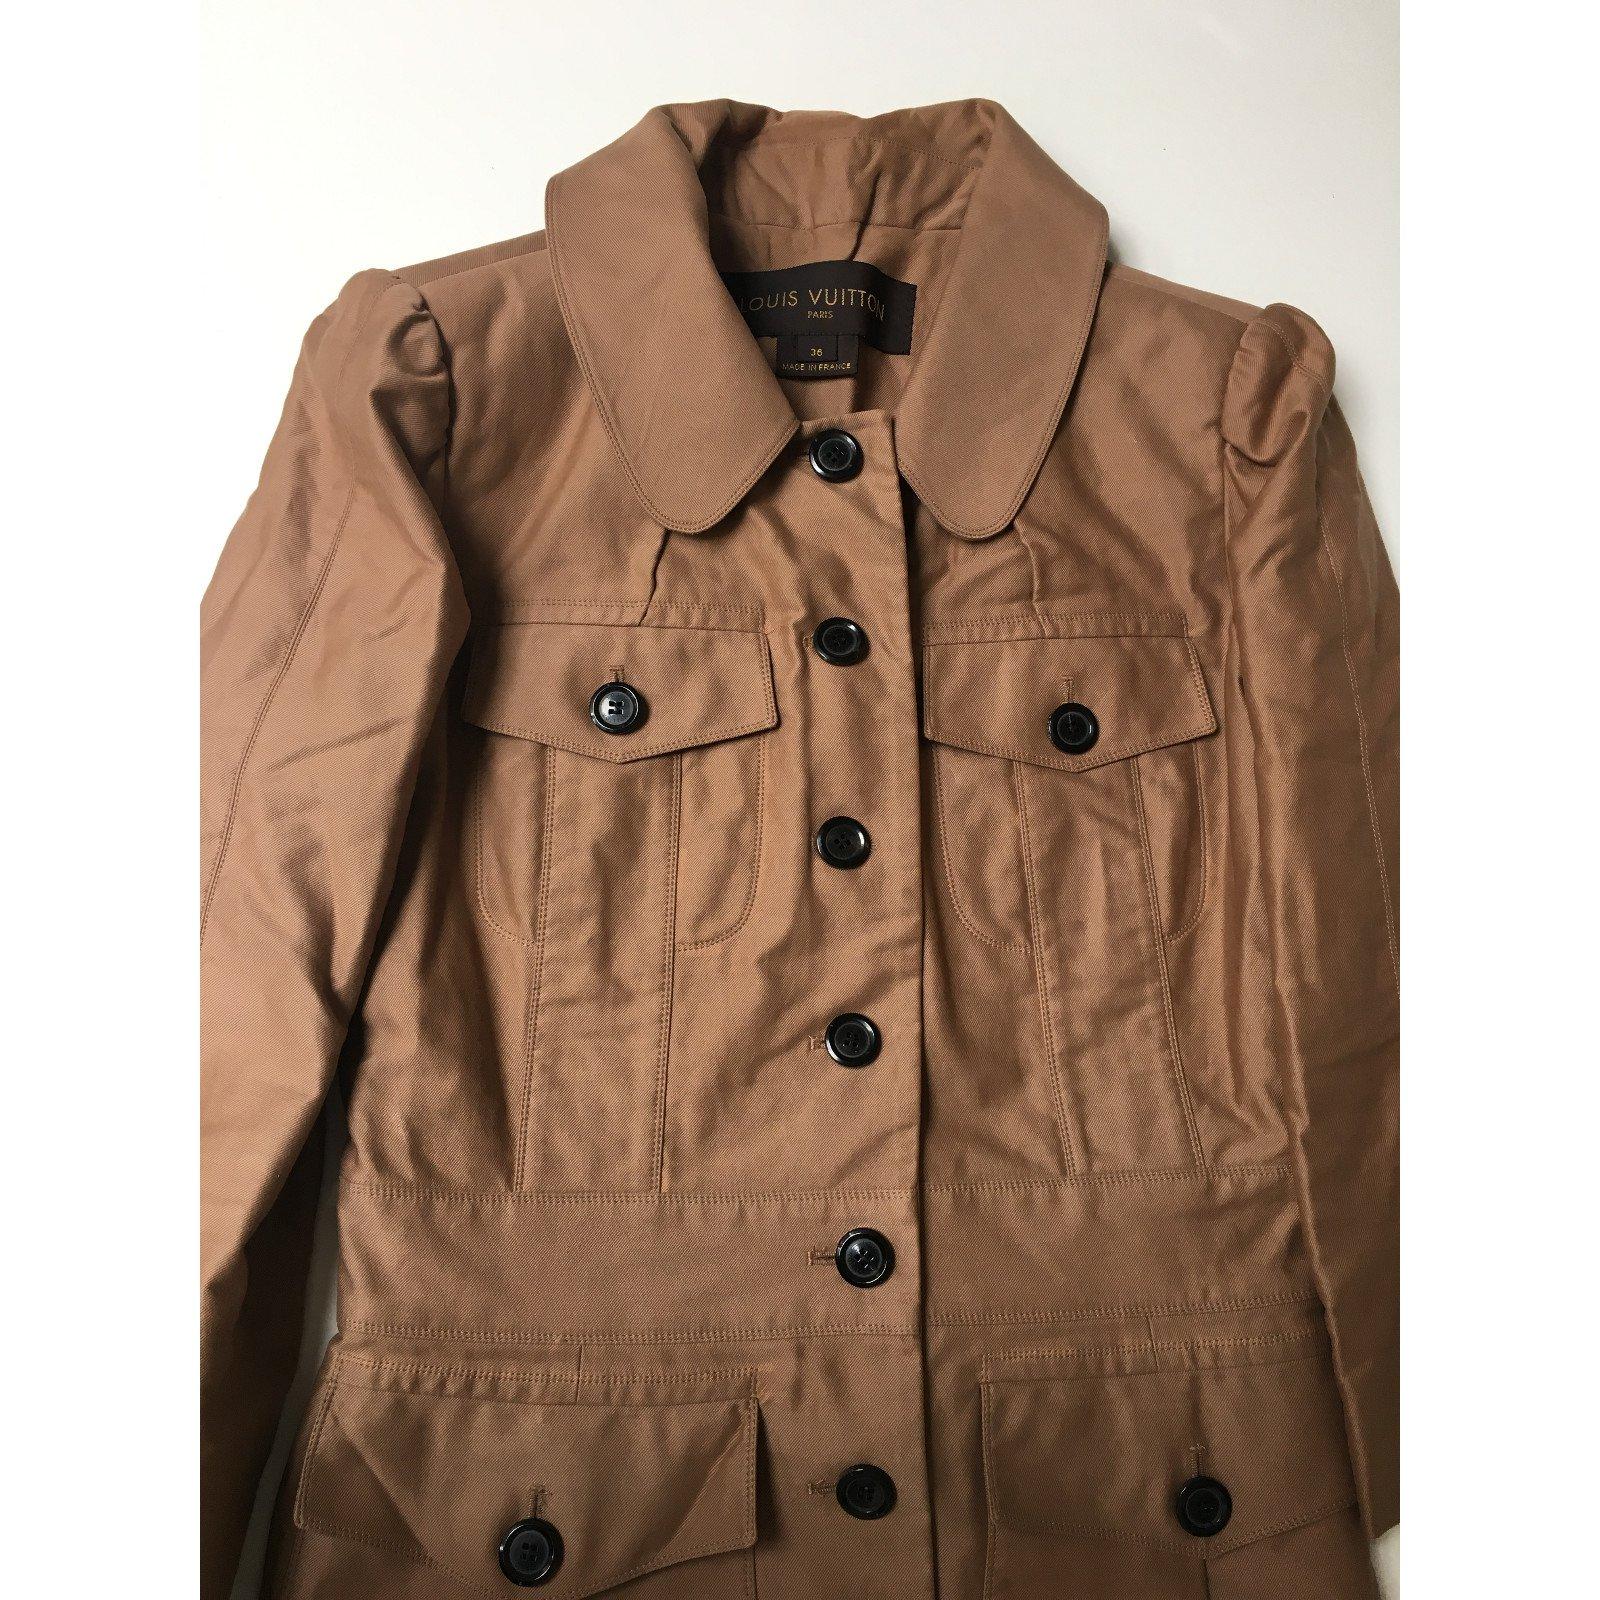 Louis Vuitton Jacket Jackets Cotton Caramel Ref 39700